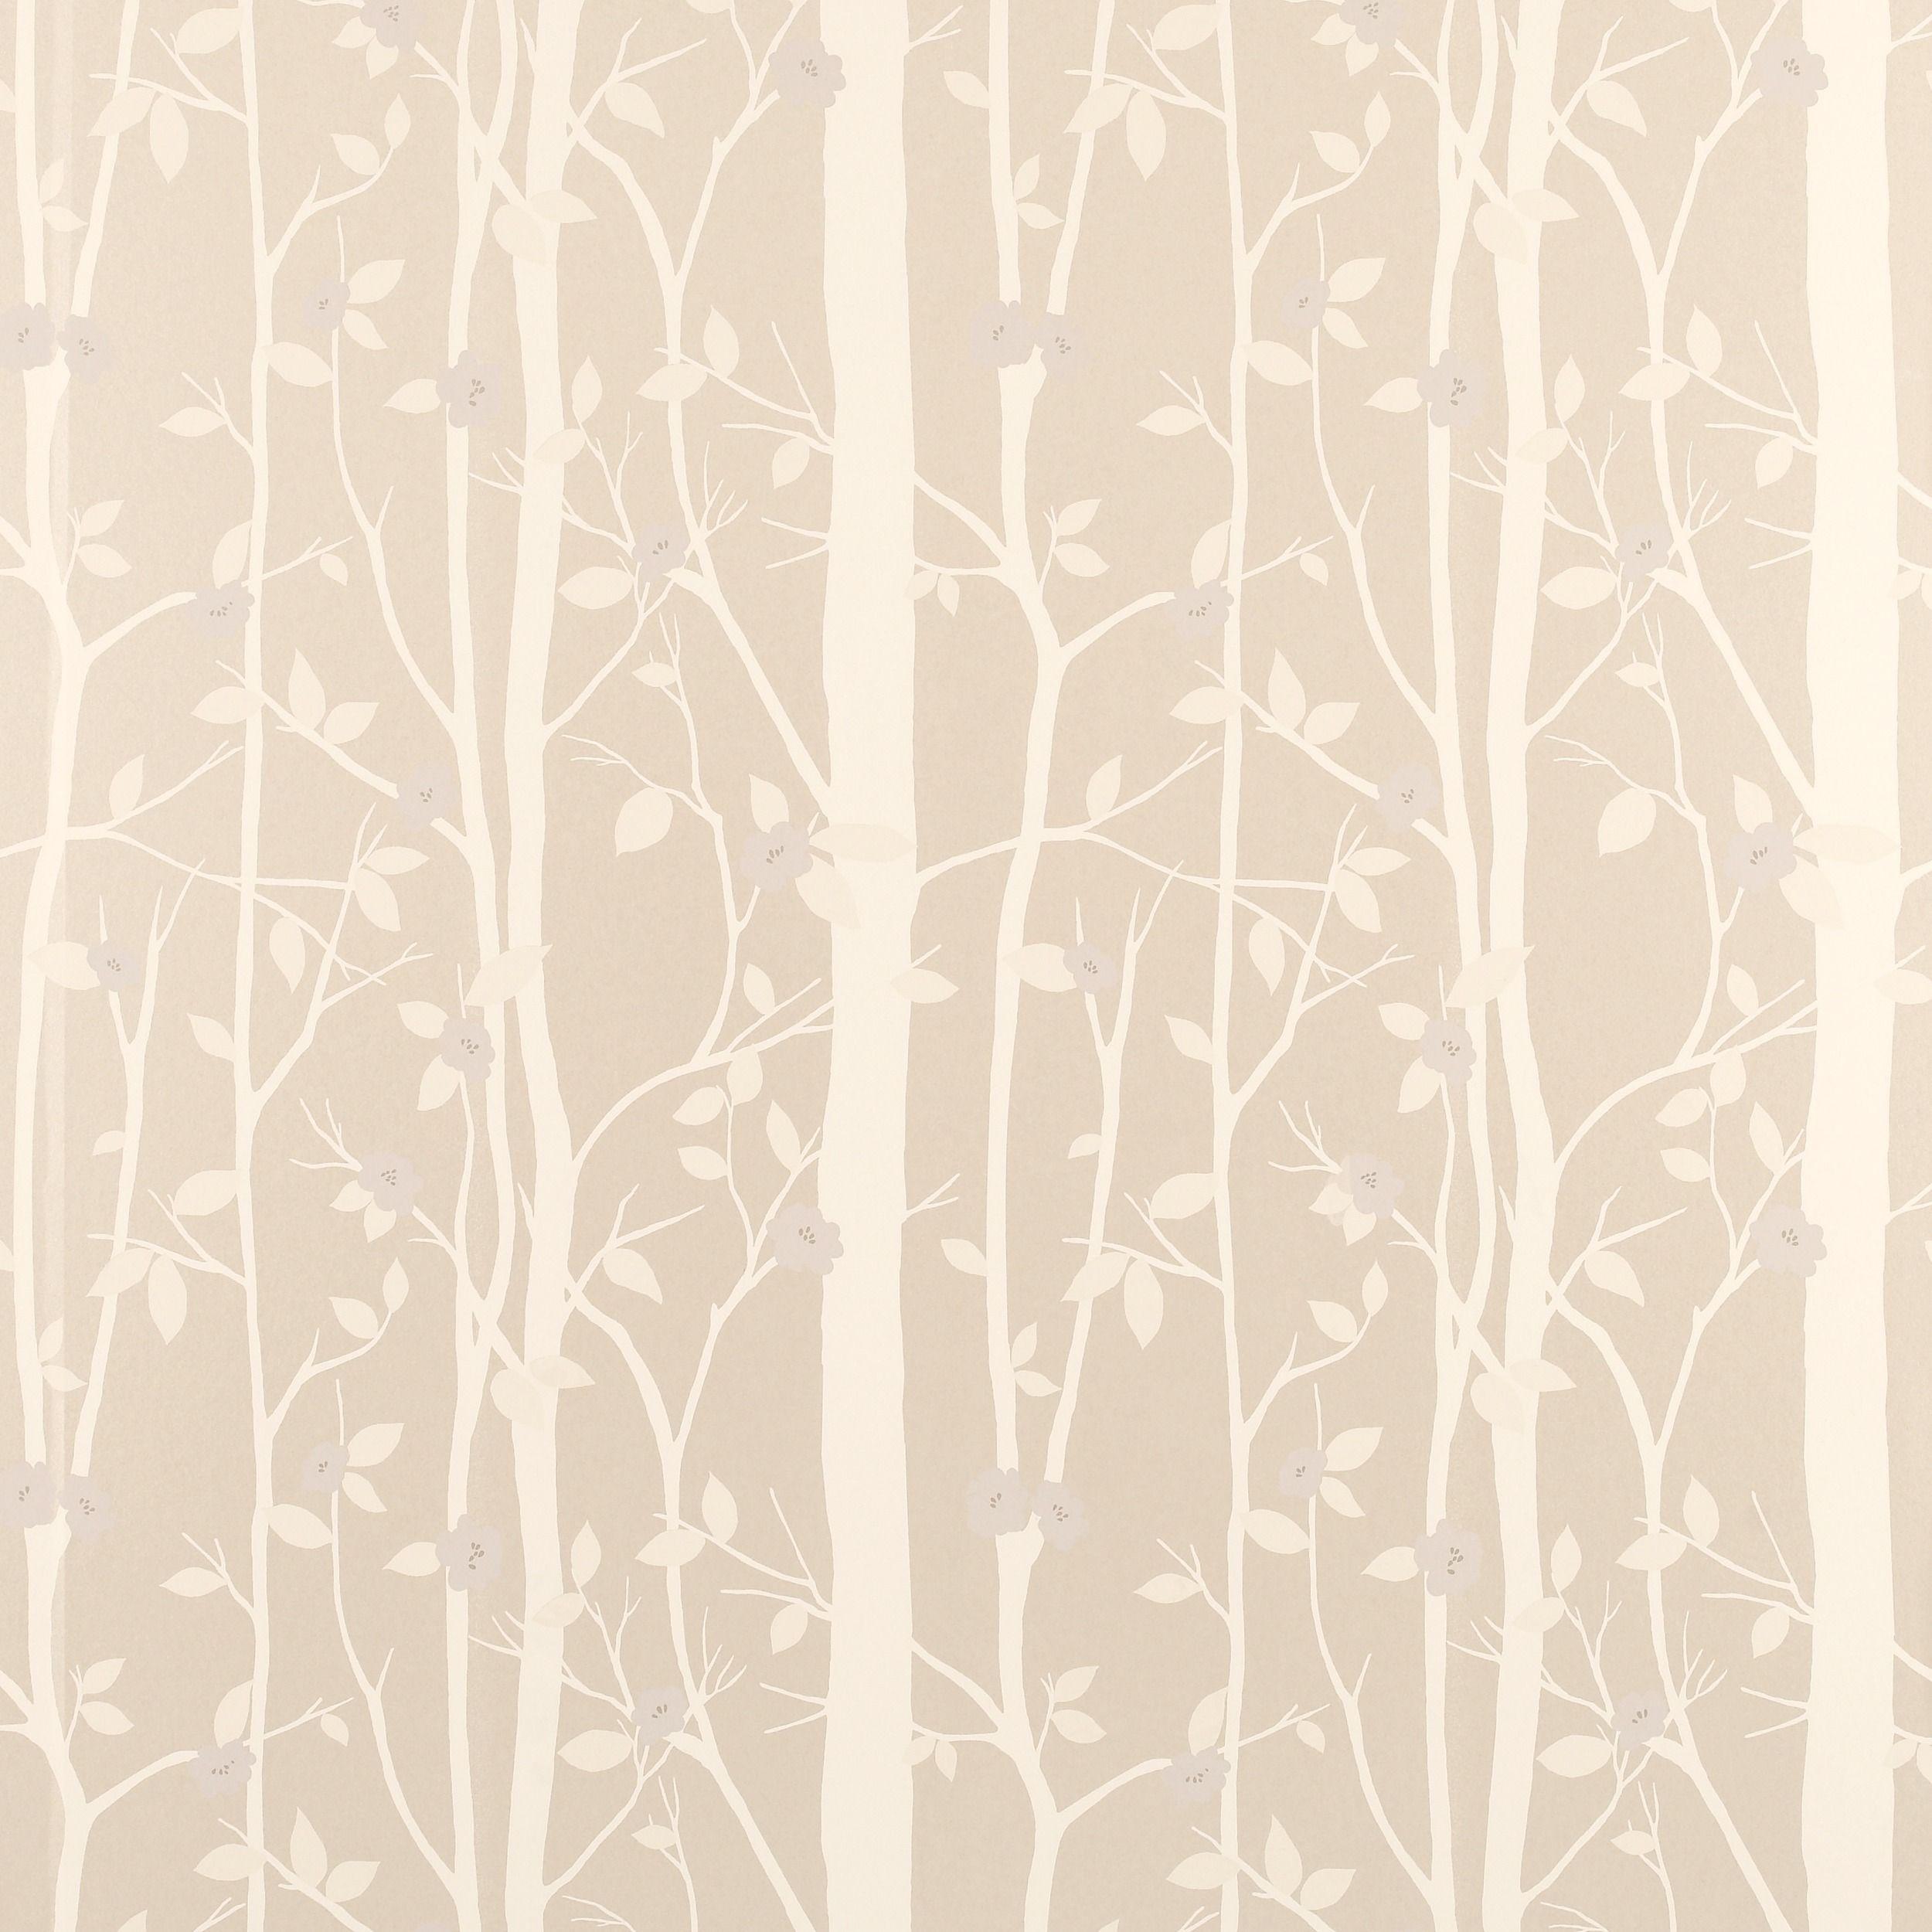 Cottonwood Natural Leaf Wallpaper - at LAURA ASHLEY